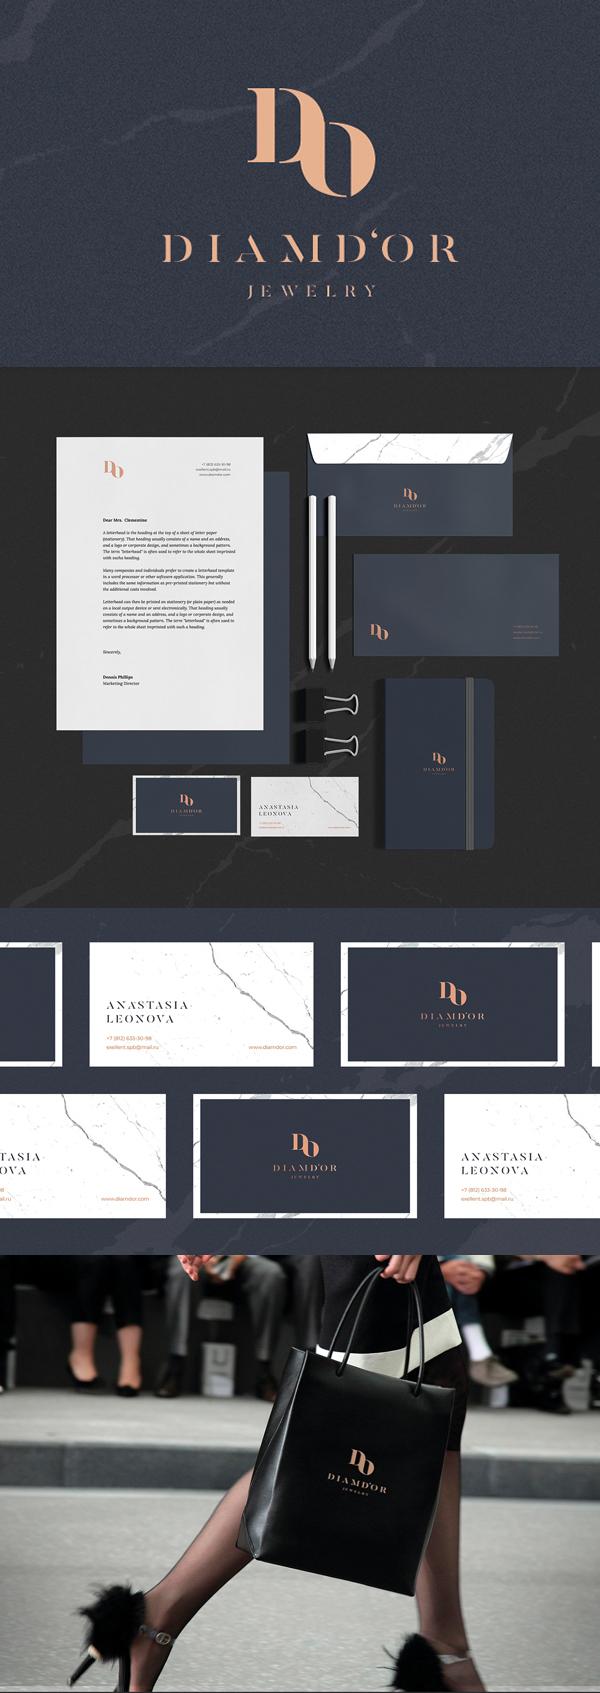 Branding: DIAMD'OR Jewelry Logotype & Branding by M axim Sitov